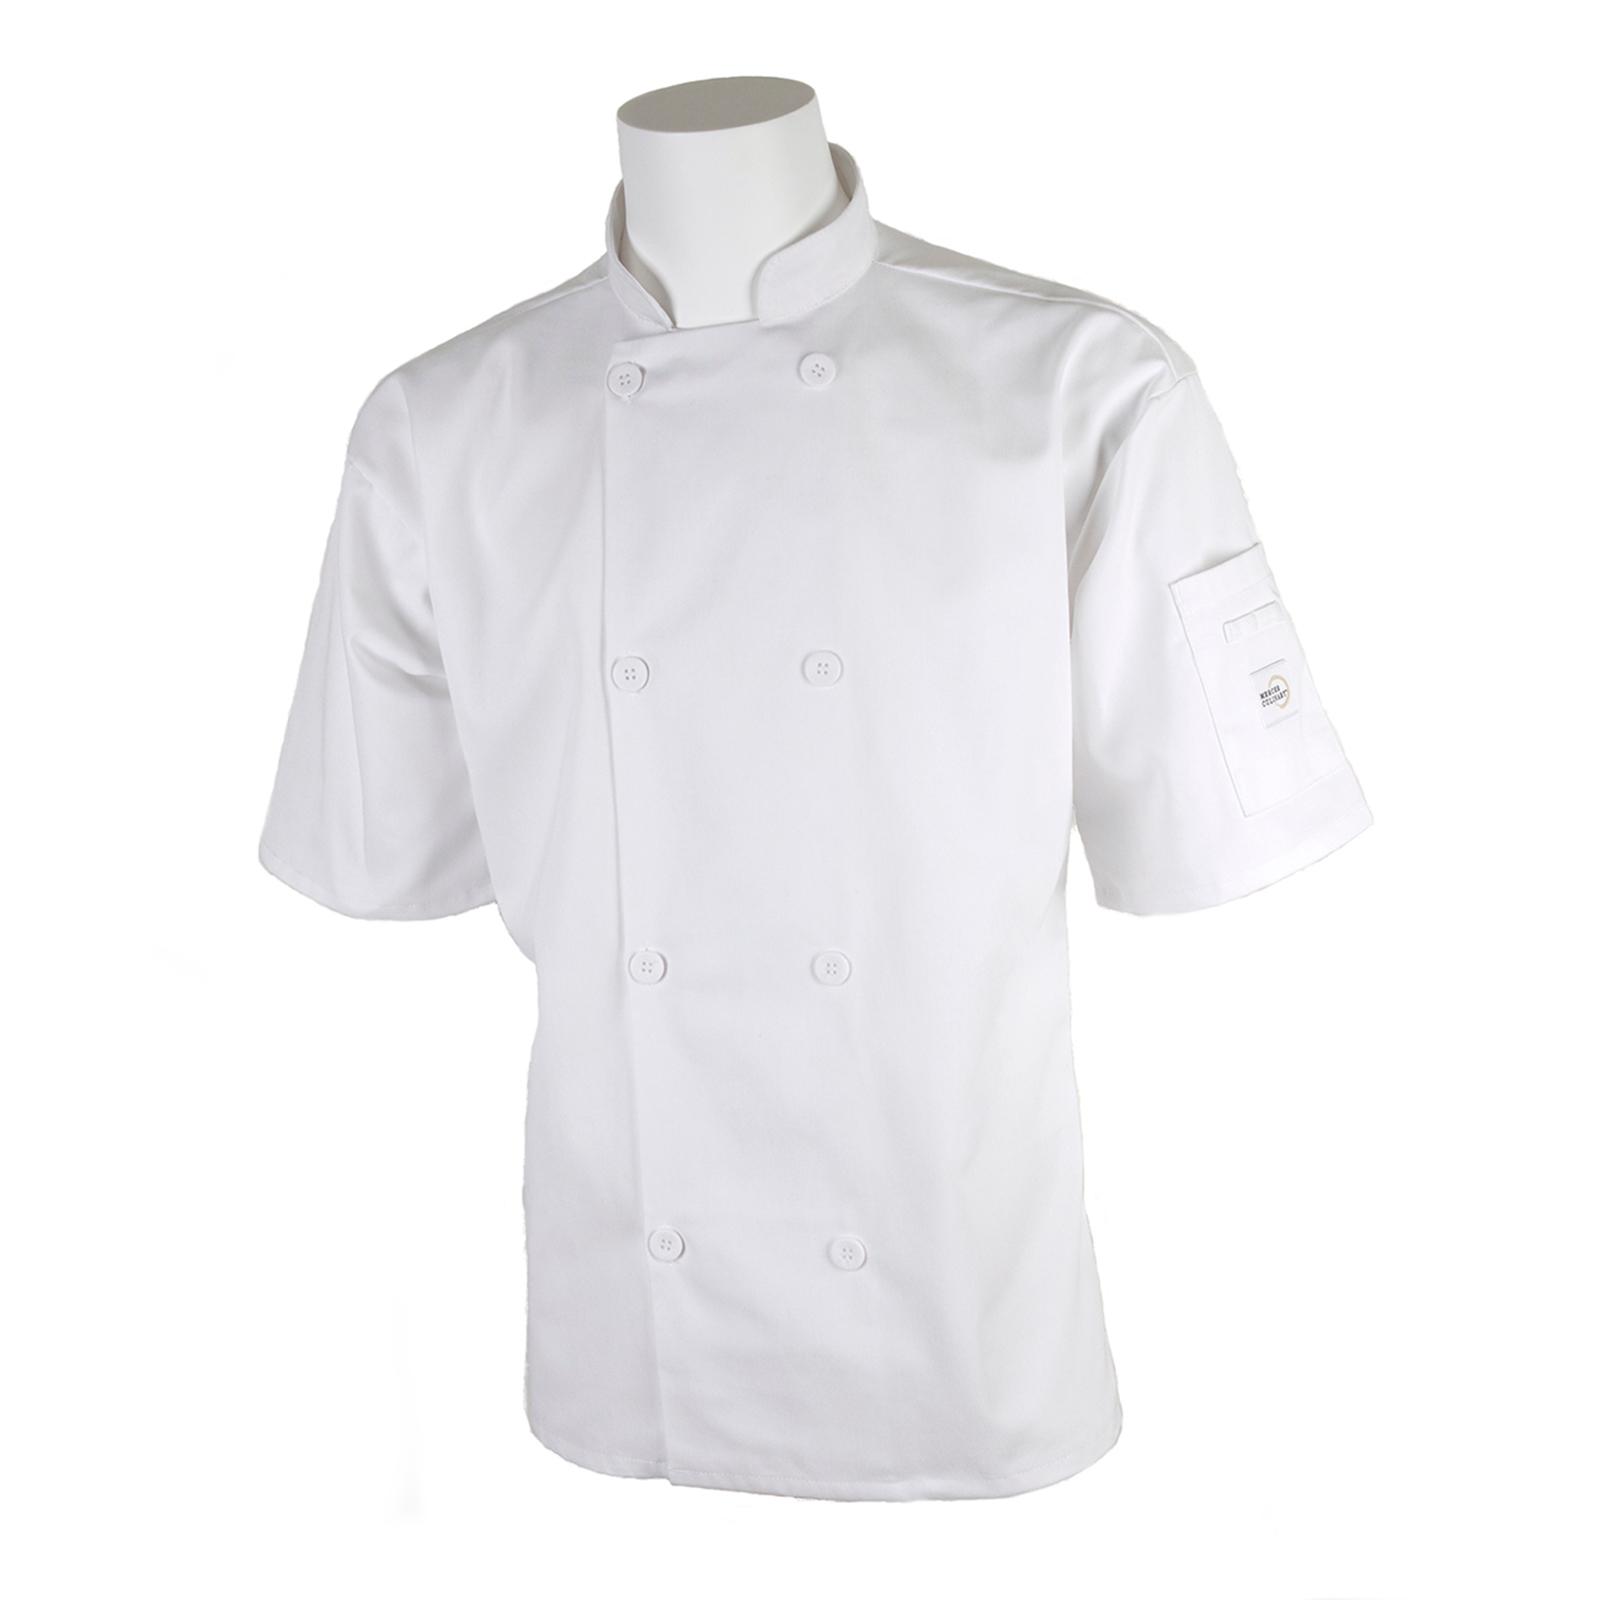 Mercer Culinary M60013WH5X chef's coat